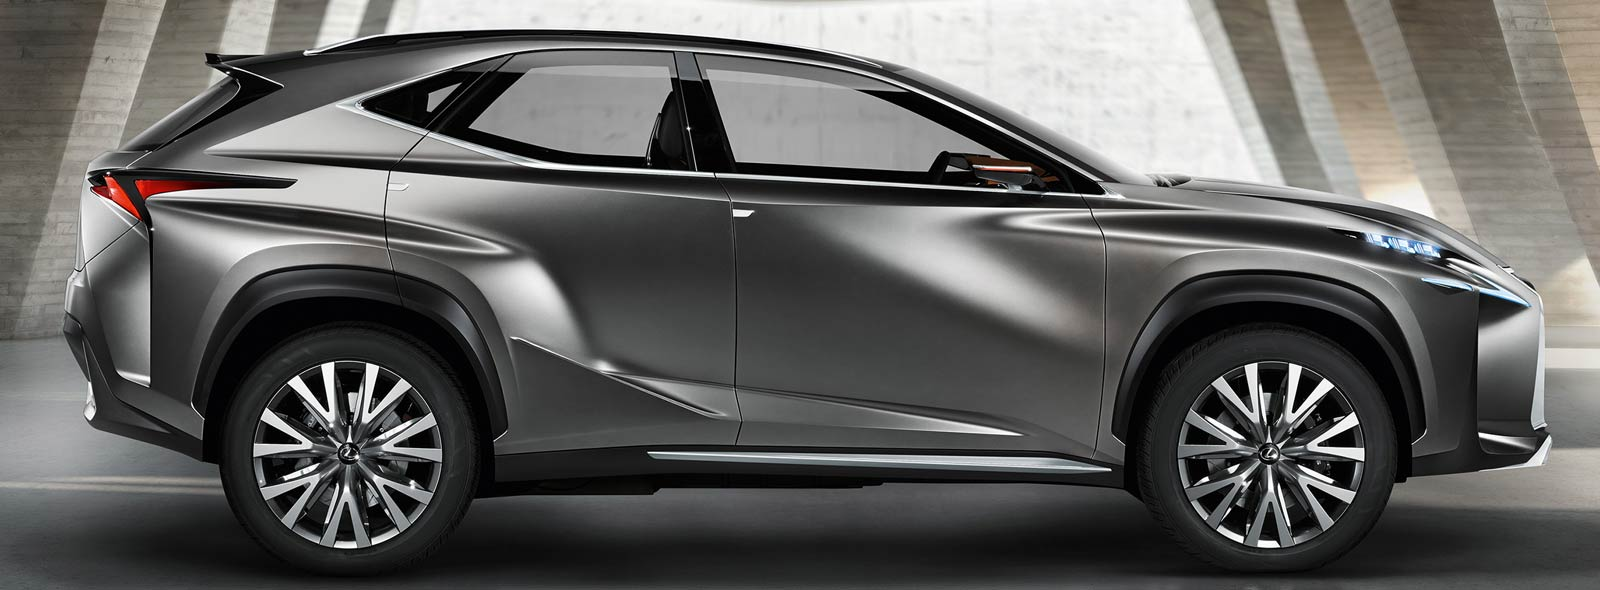 Yan görünüş Lexus LF NX konsepsiyası